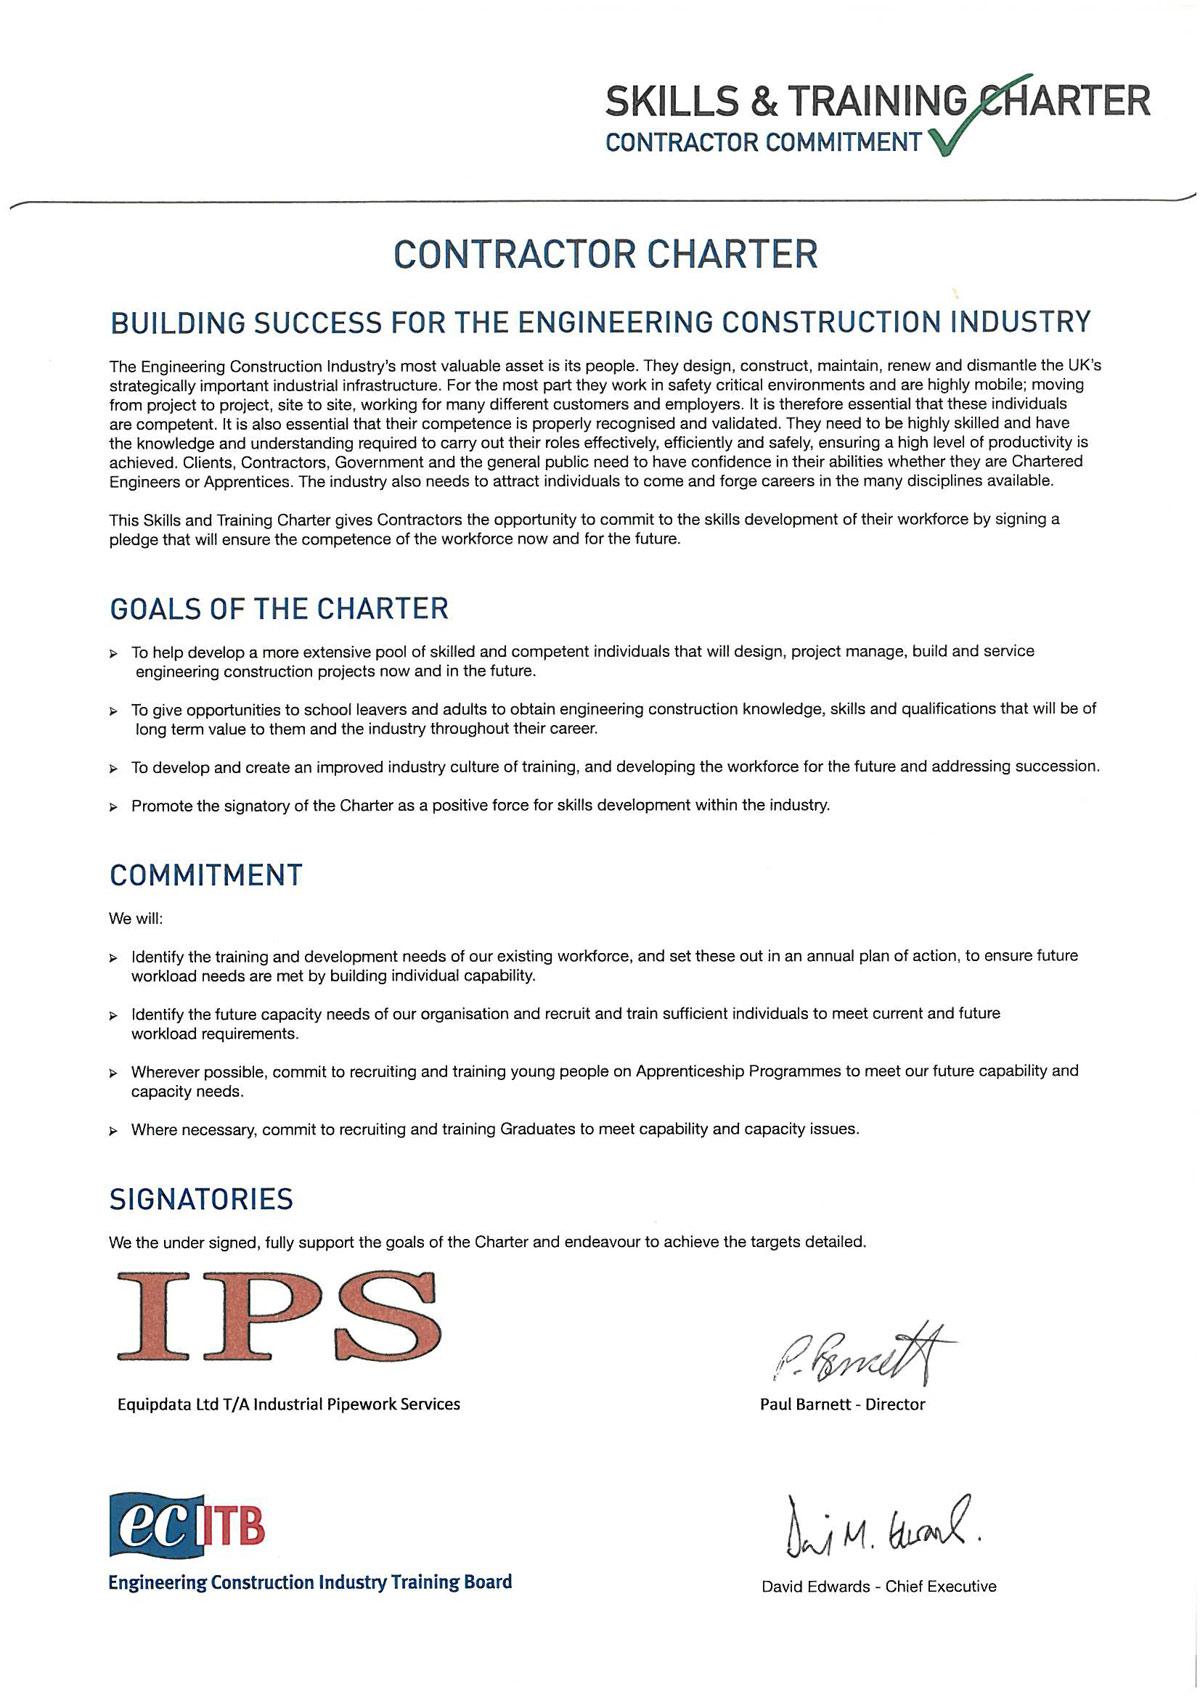 ECITB Regional Manager David Lewis presenting Skills & Training Charter to IPS Operations Director Paul Barnett.